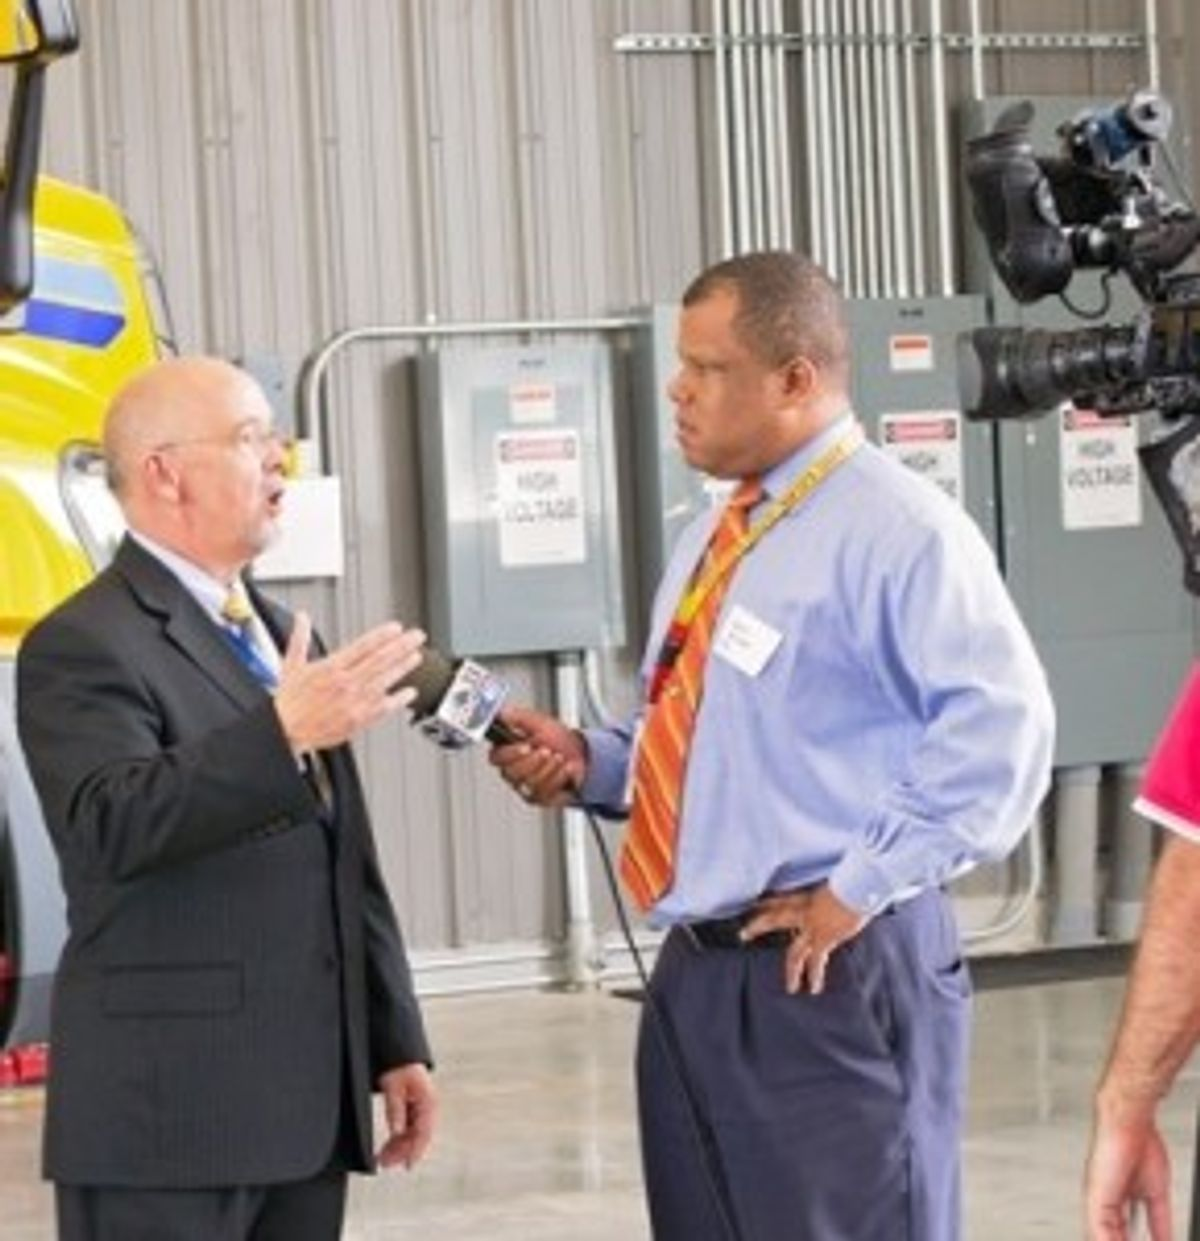 Penske Opens New Full-Service Location in Alabaster, Alabama